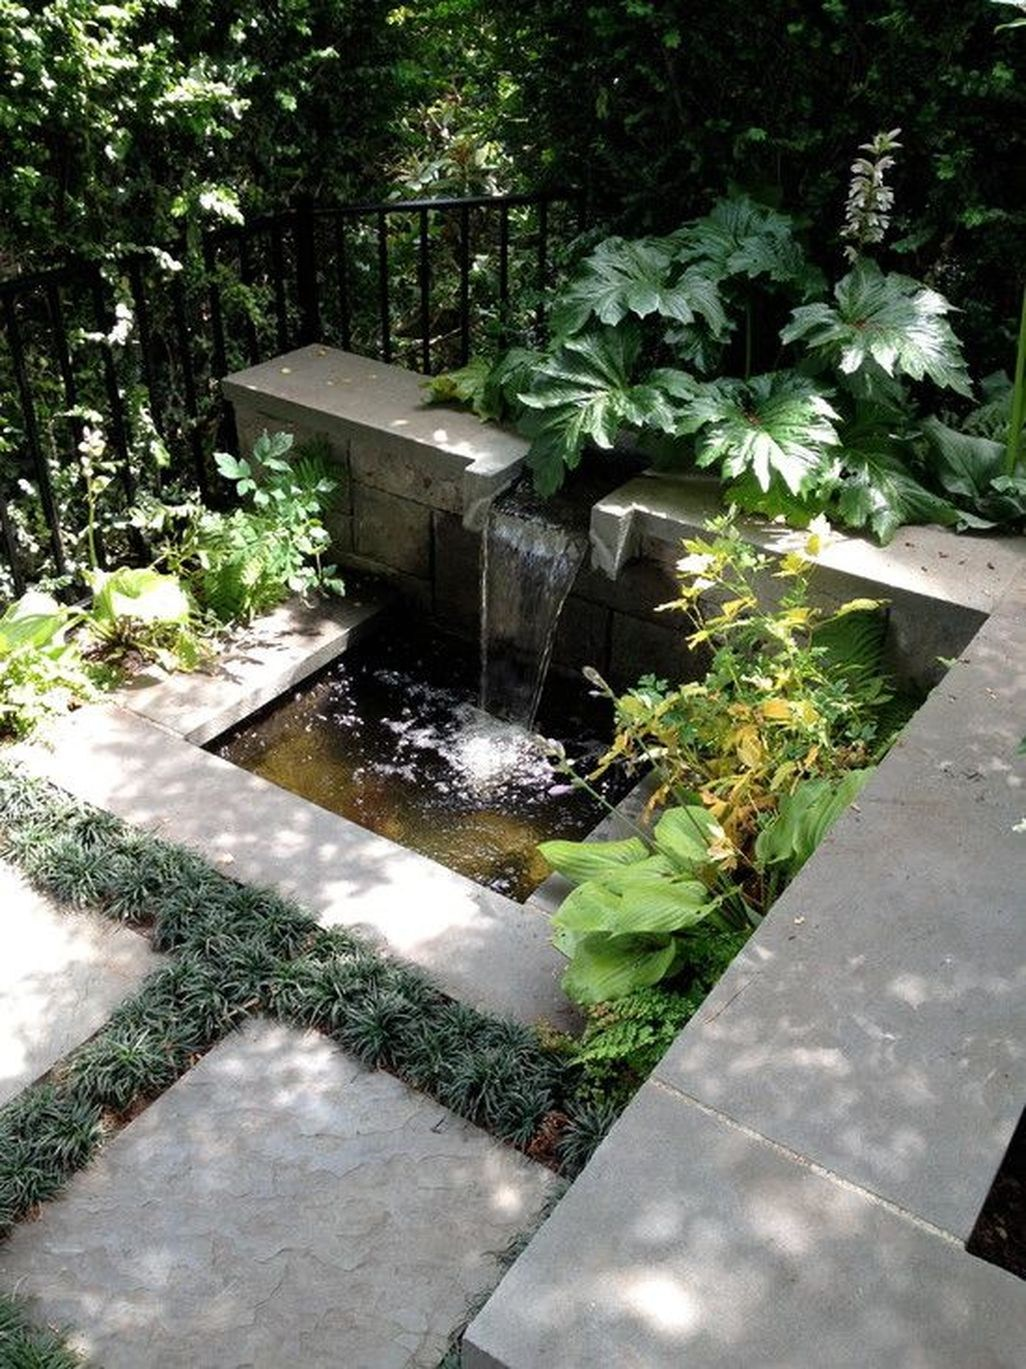 49 Inspiring Zen Water Fountain Ideas Garden Landscaping - TREND4HOMY